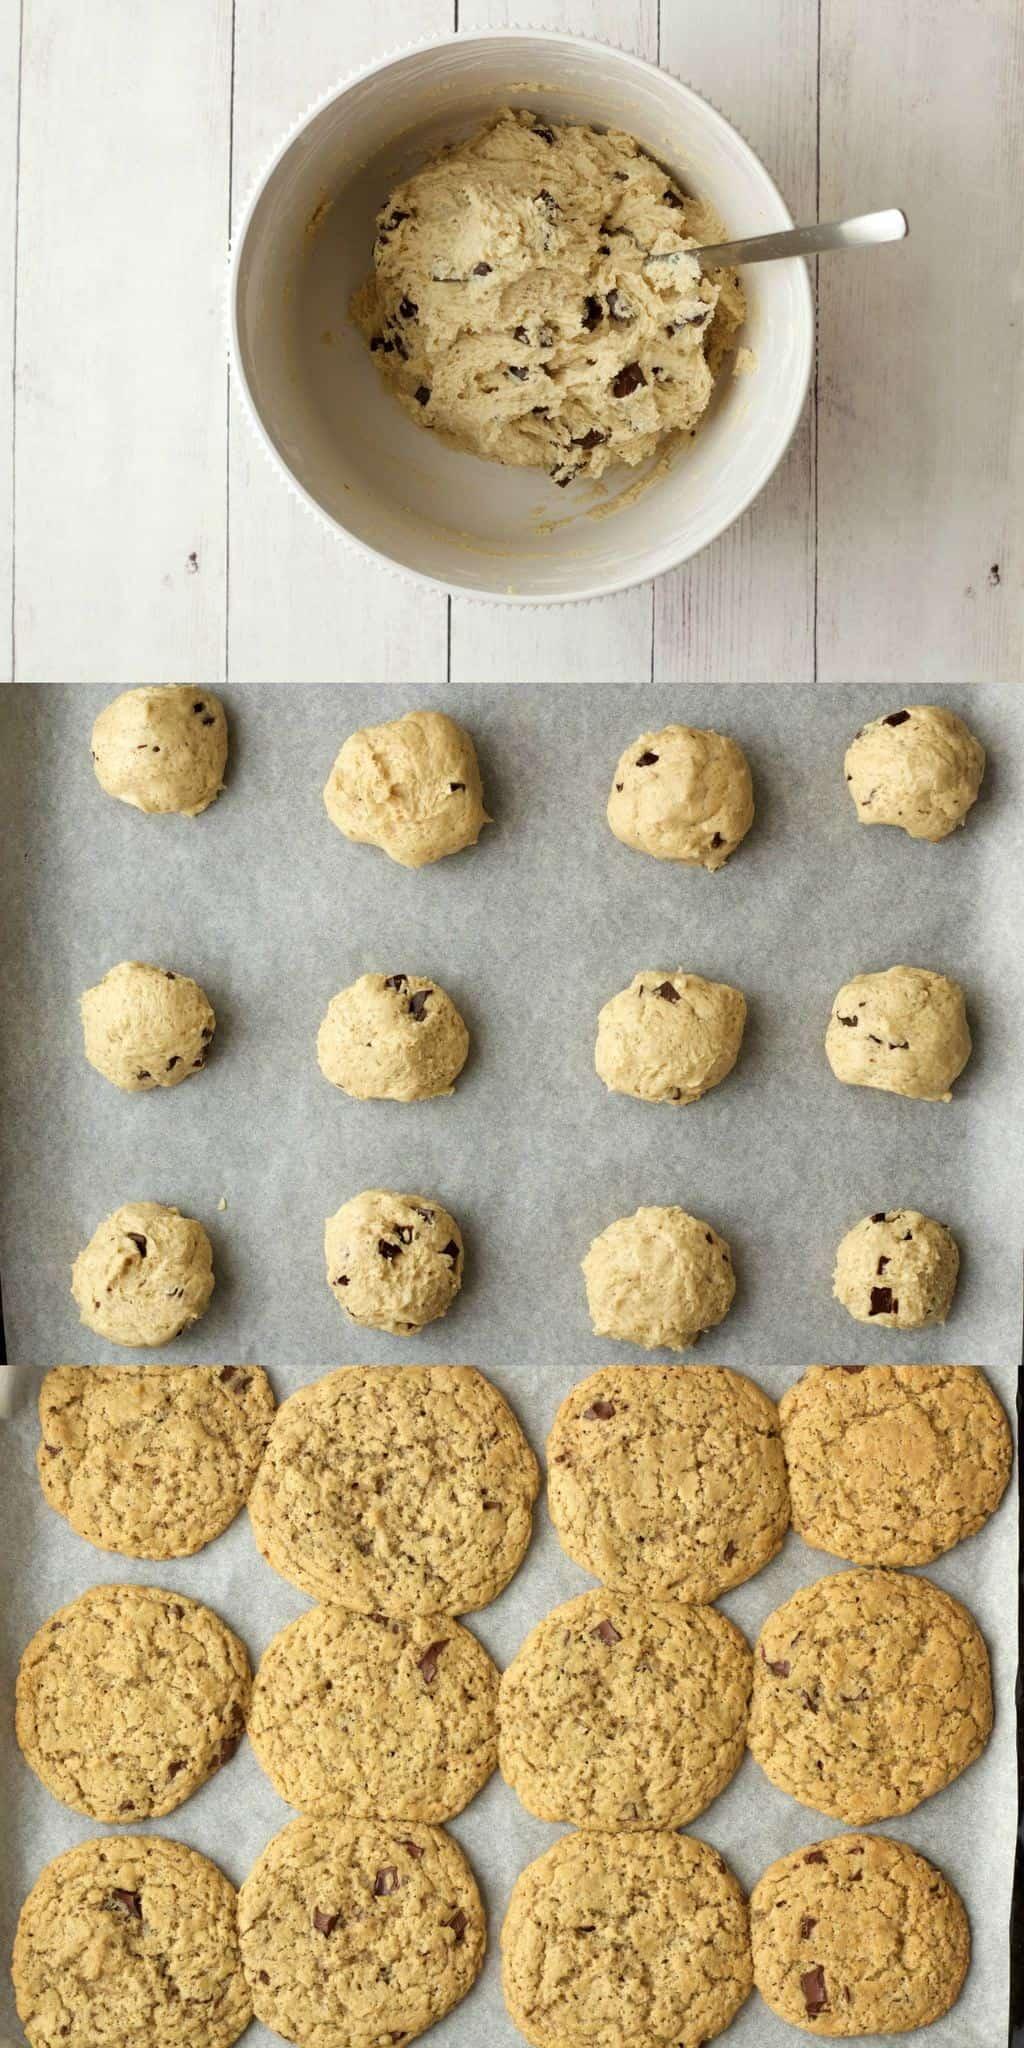 Making Vegan Chocolate Chip Cookies #vegan #lovingitvegan #cookies #chocolatechip